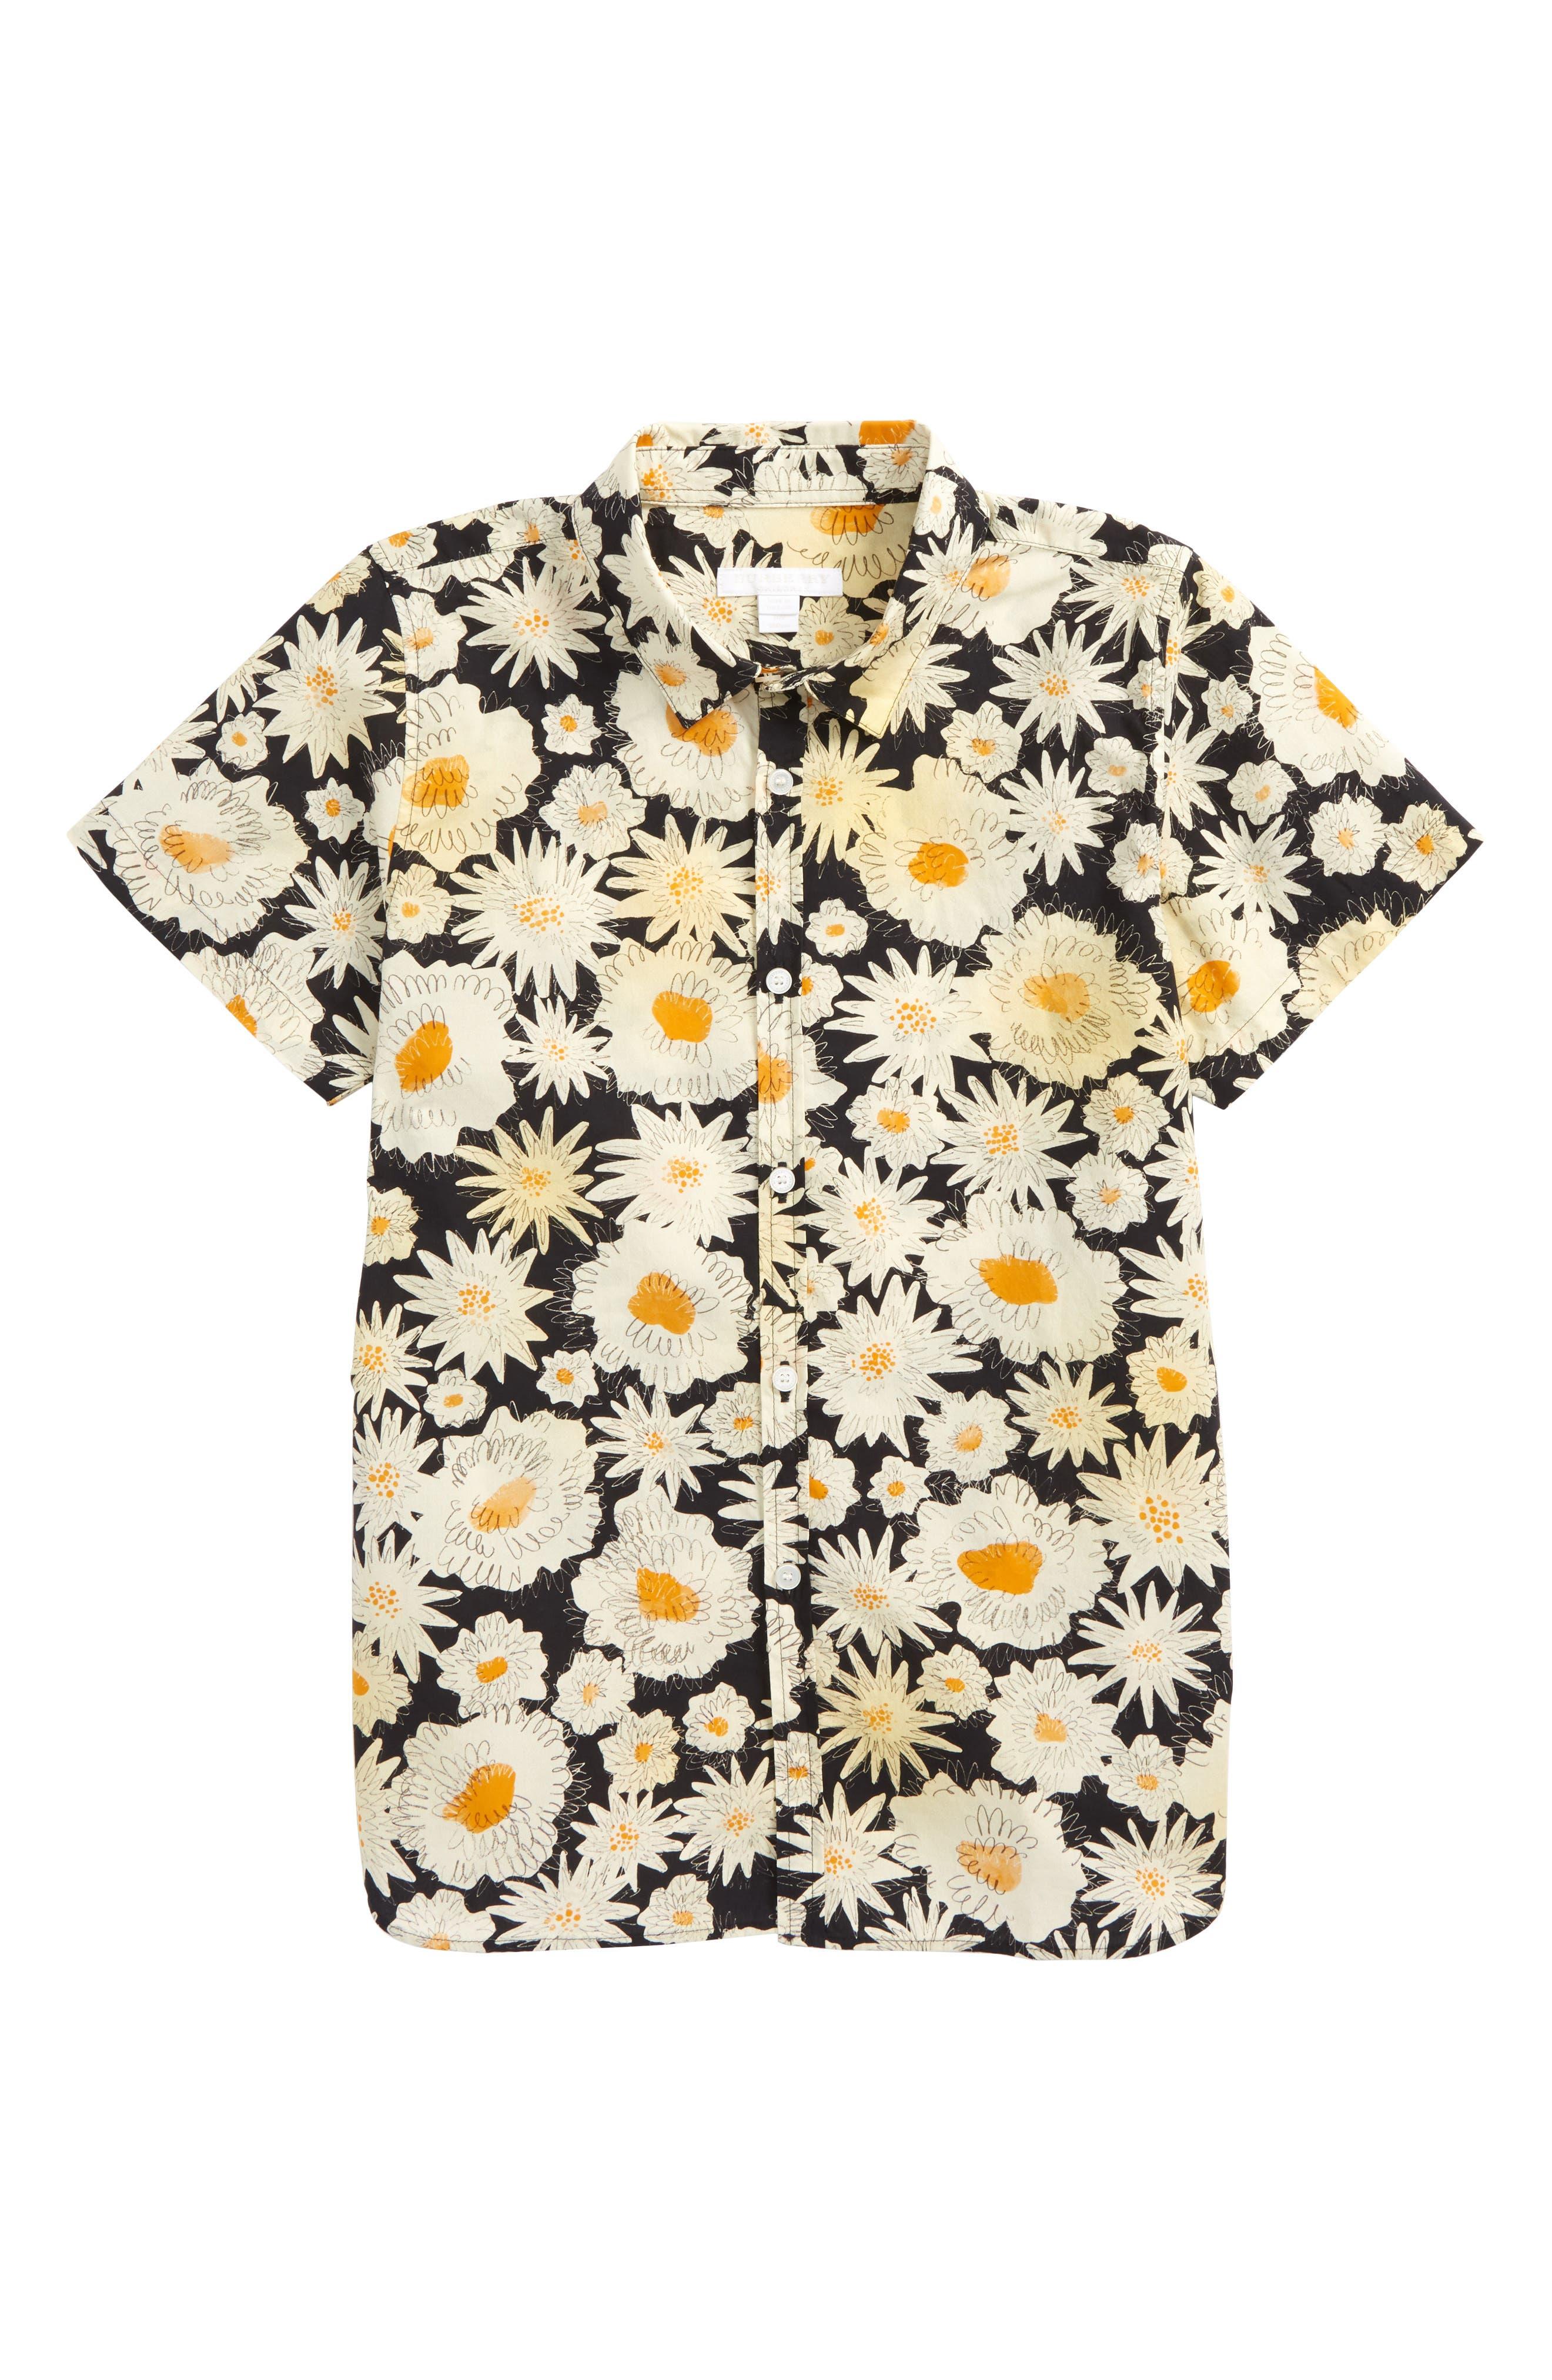 Clarkey Woven Shirt,                         Main,                         color, Black